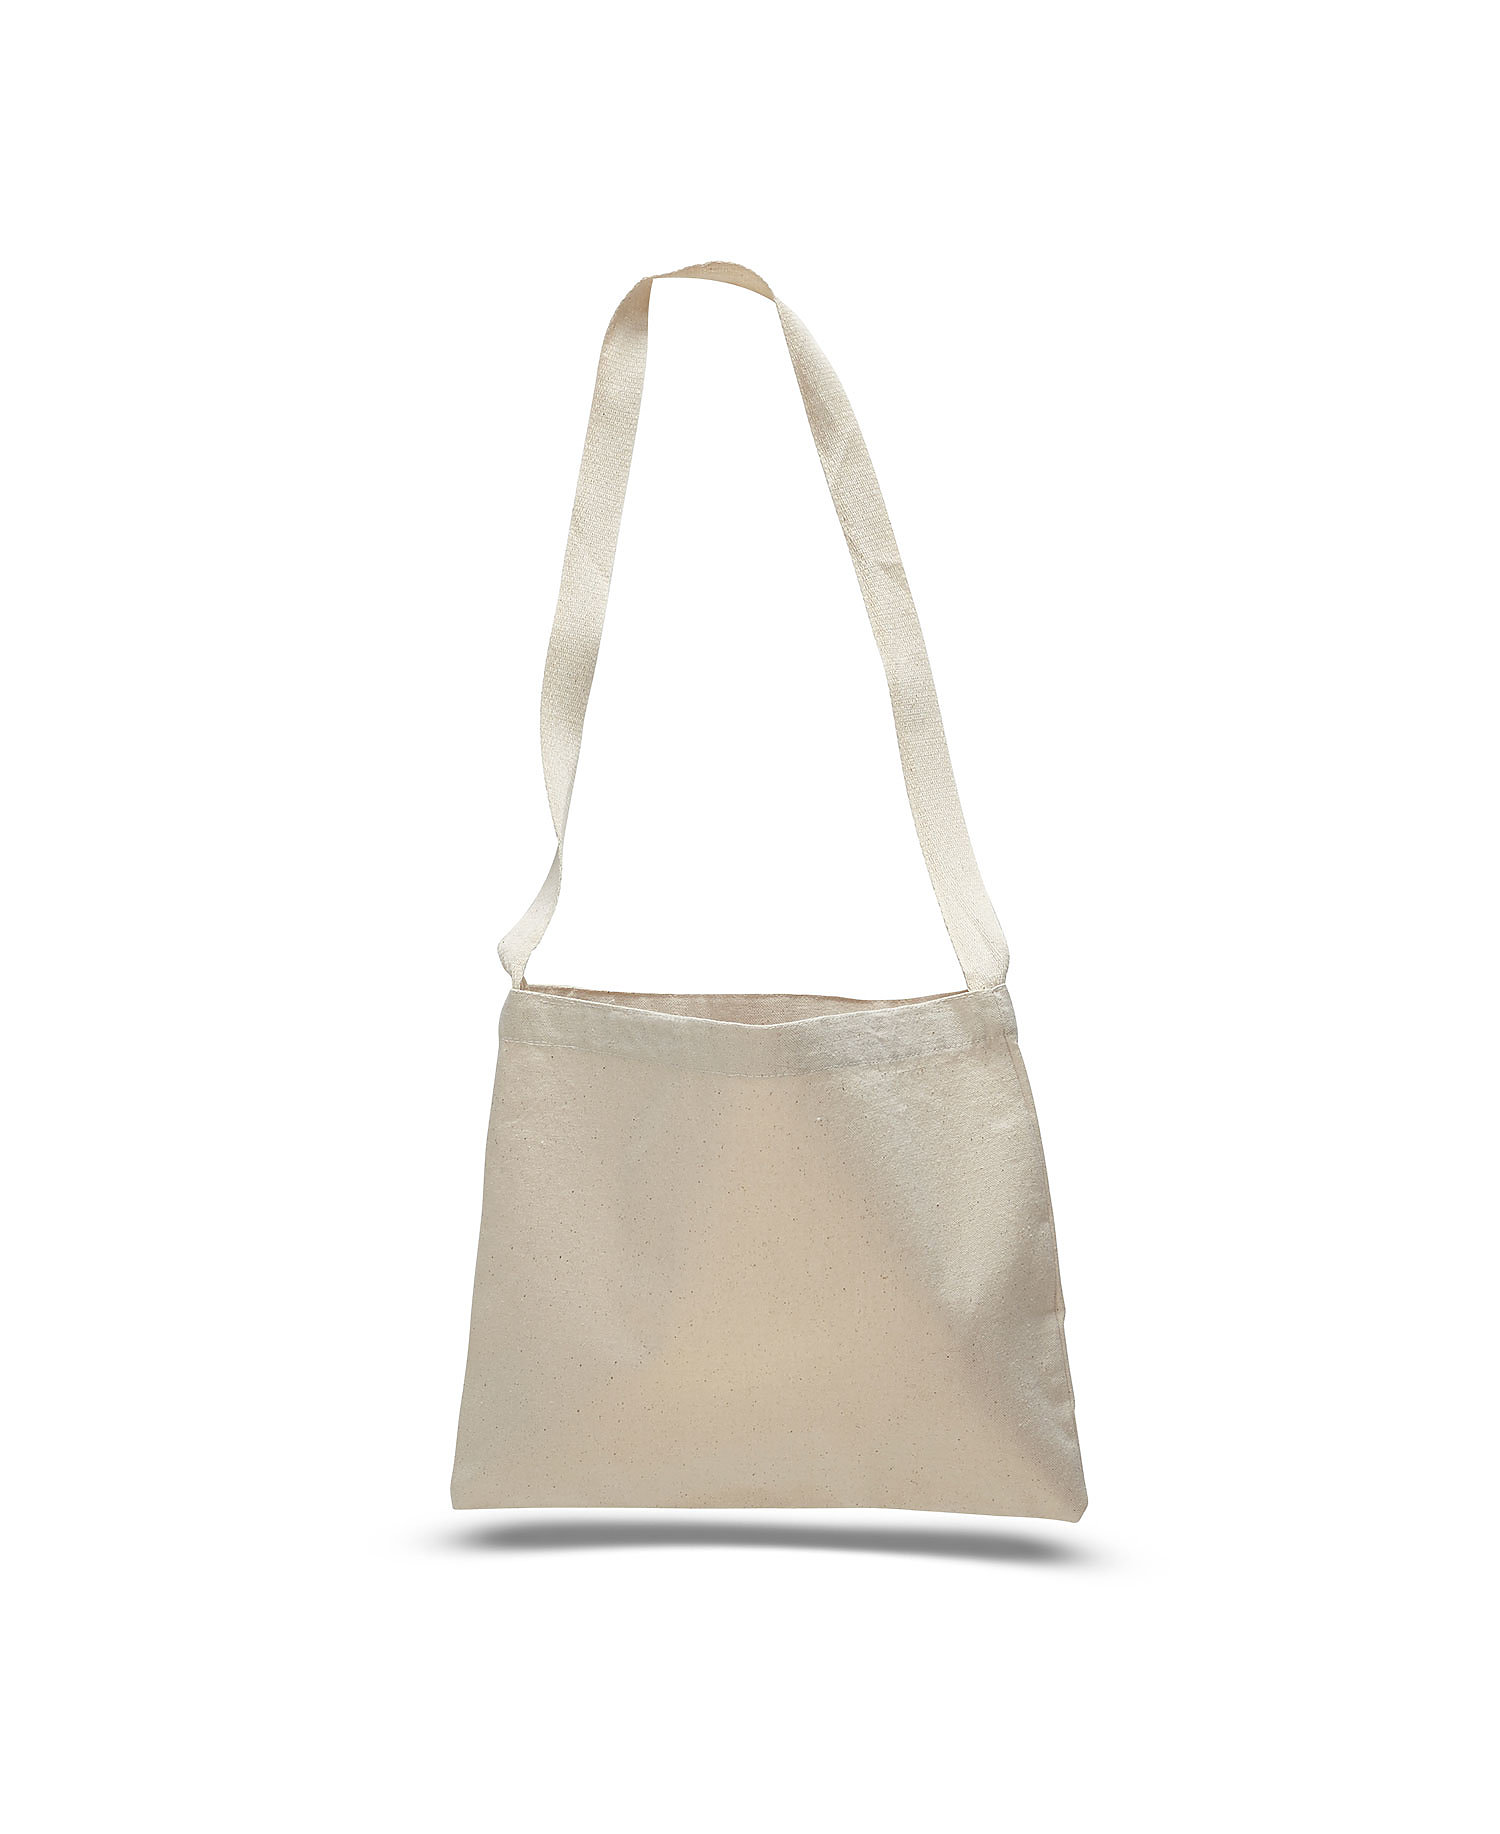 Q-Tees Q126100 - Small Messenger Bag